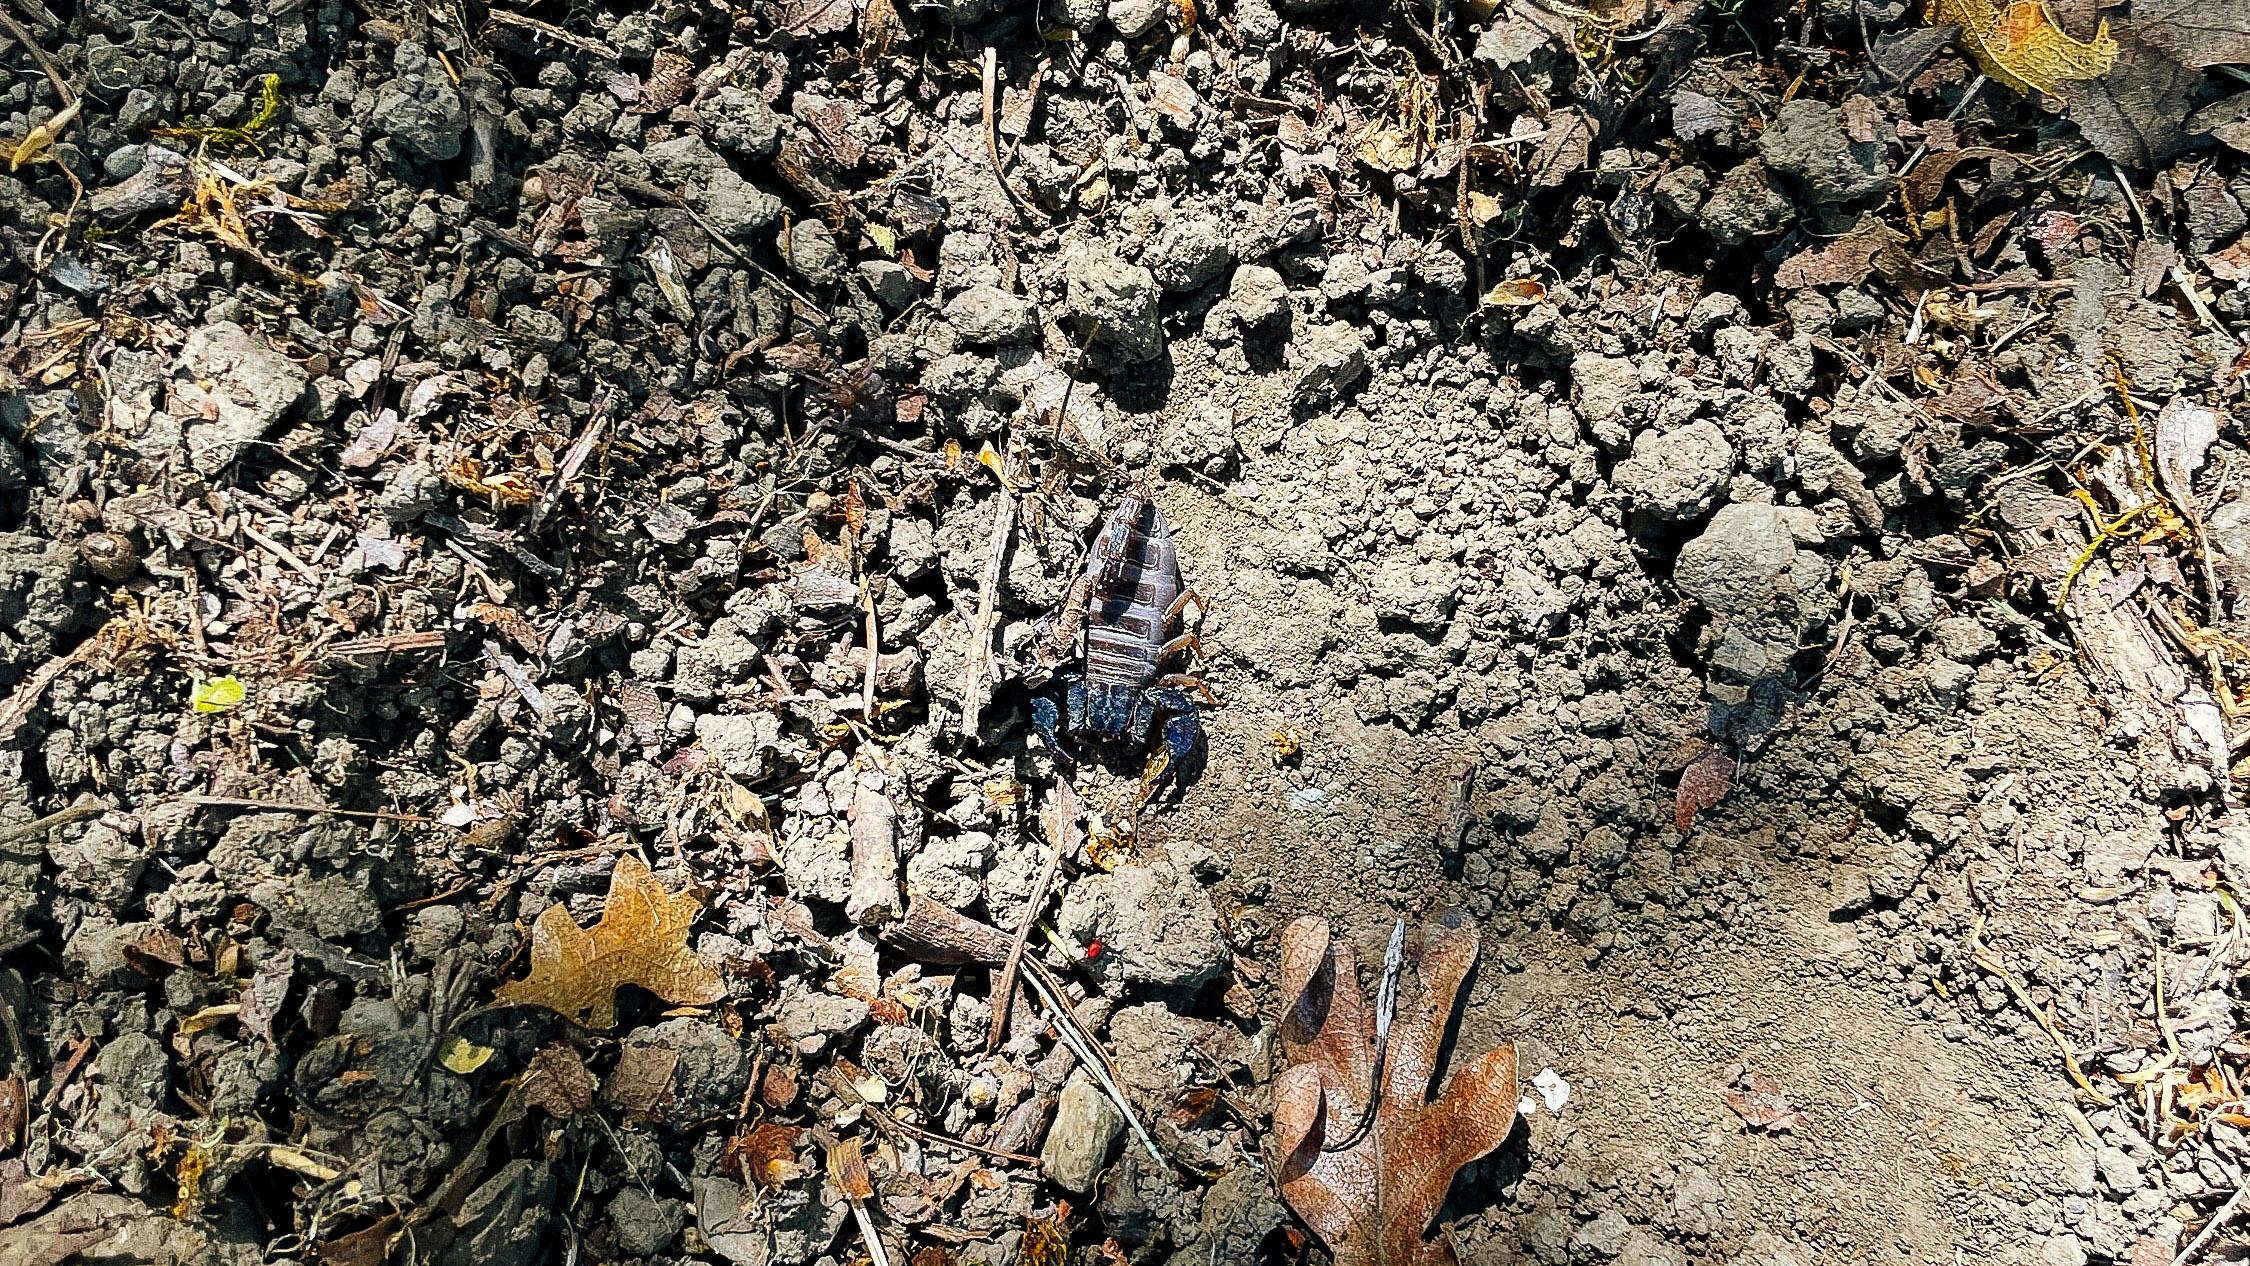 Scorpion on a dirt path